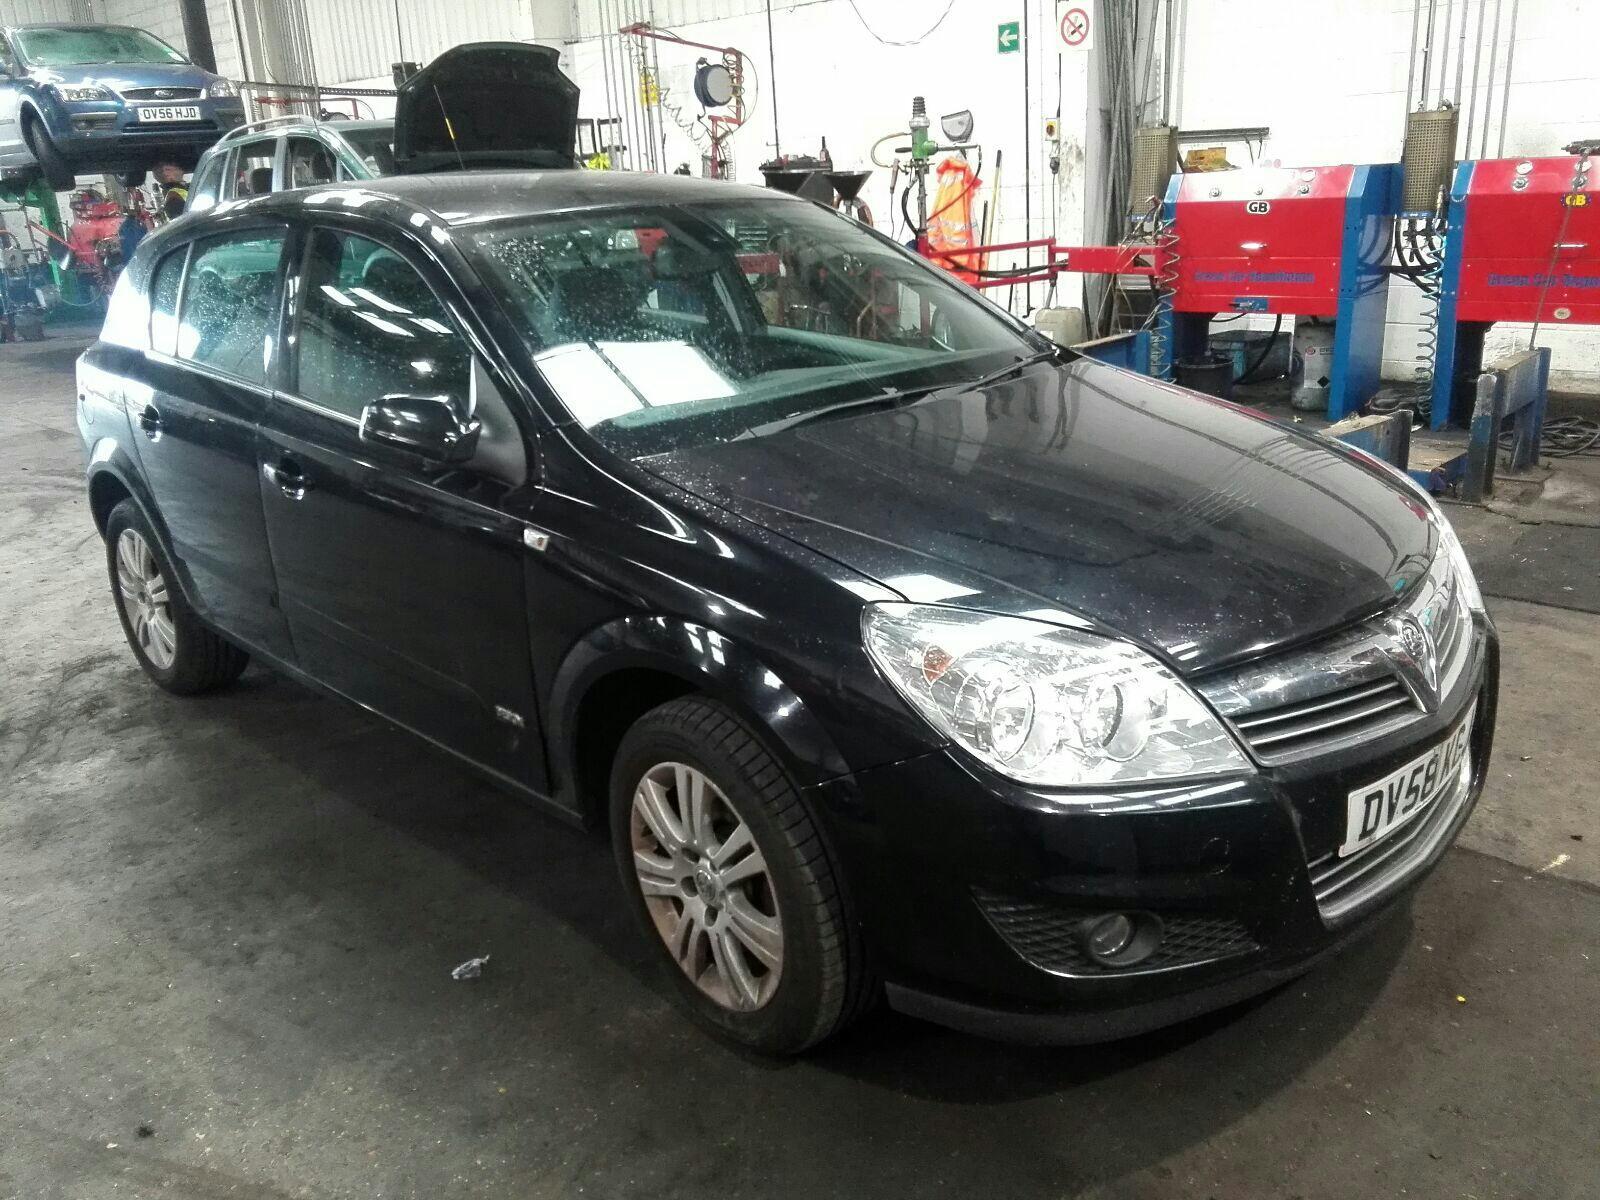 Image for a Vauxhall Astra 2008 5 Door Hatchback